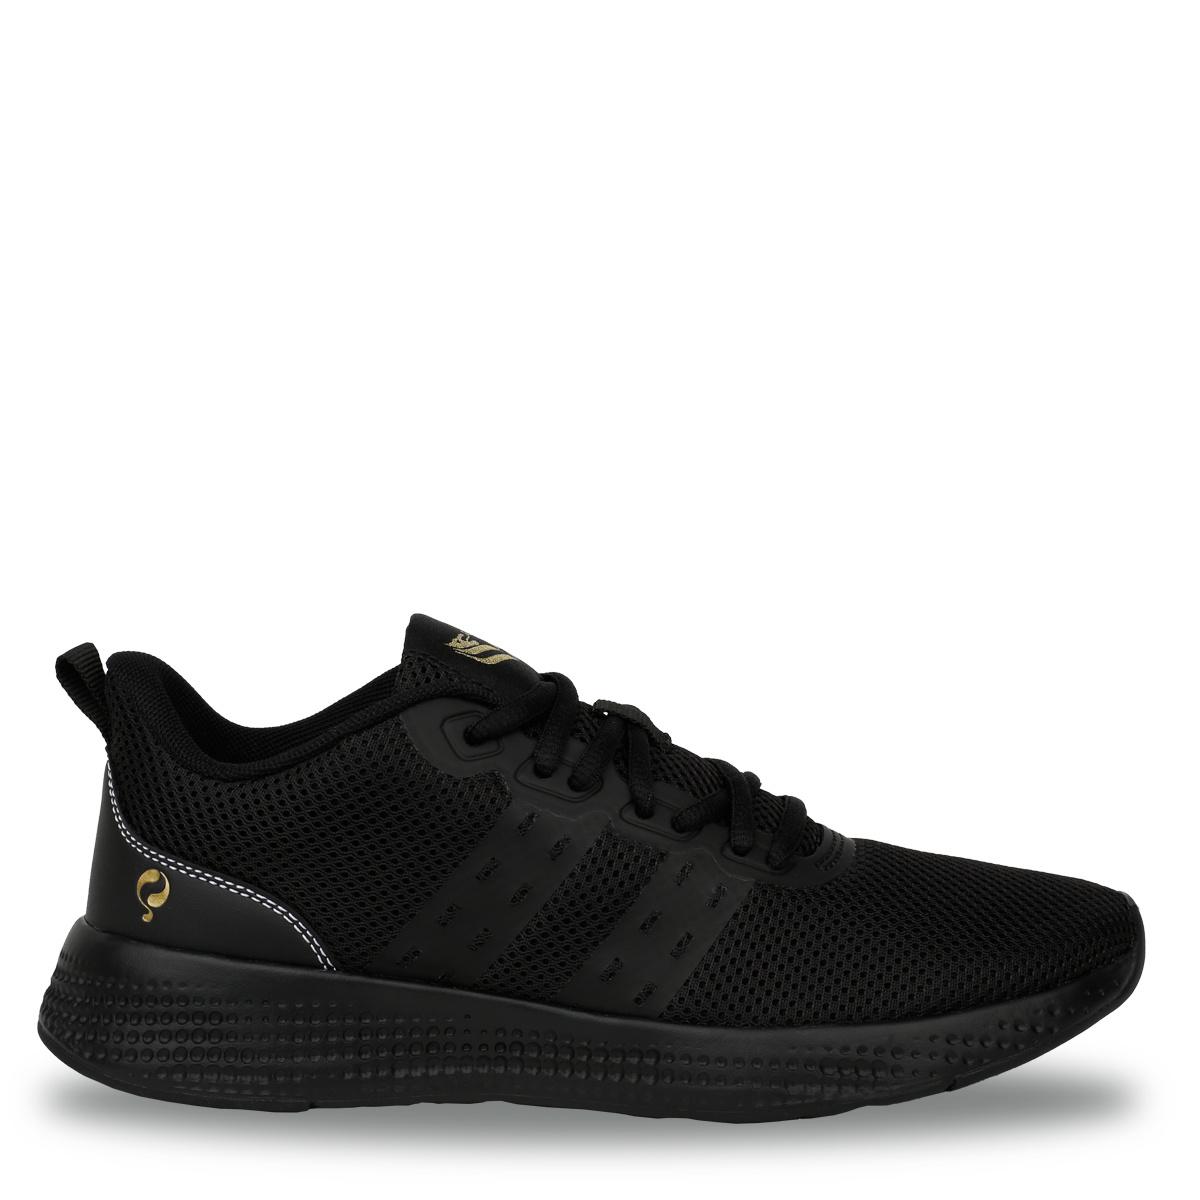 Dames Sneaker Oostduin - Zwart/Zwart